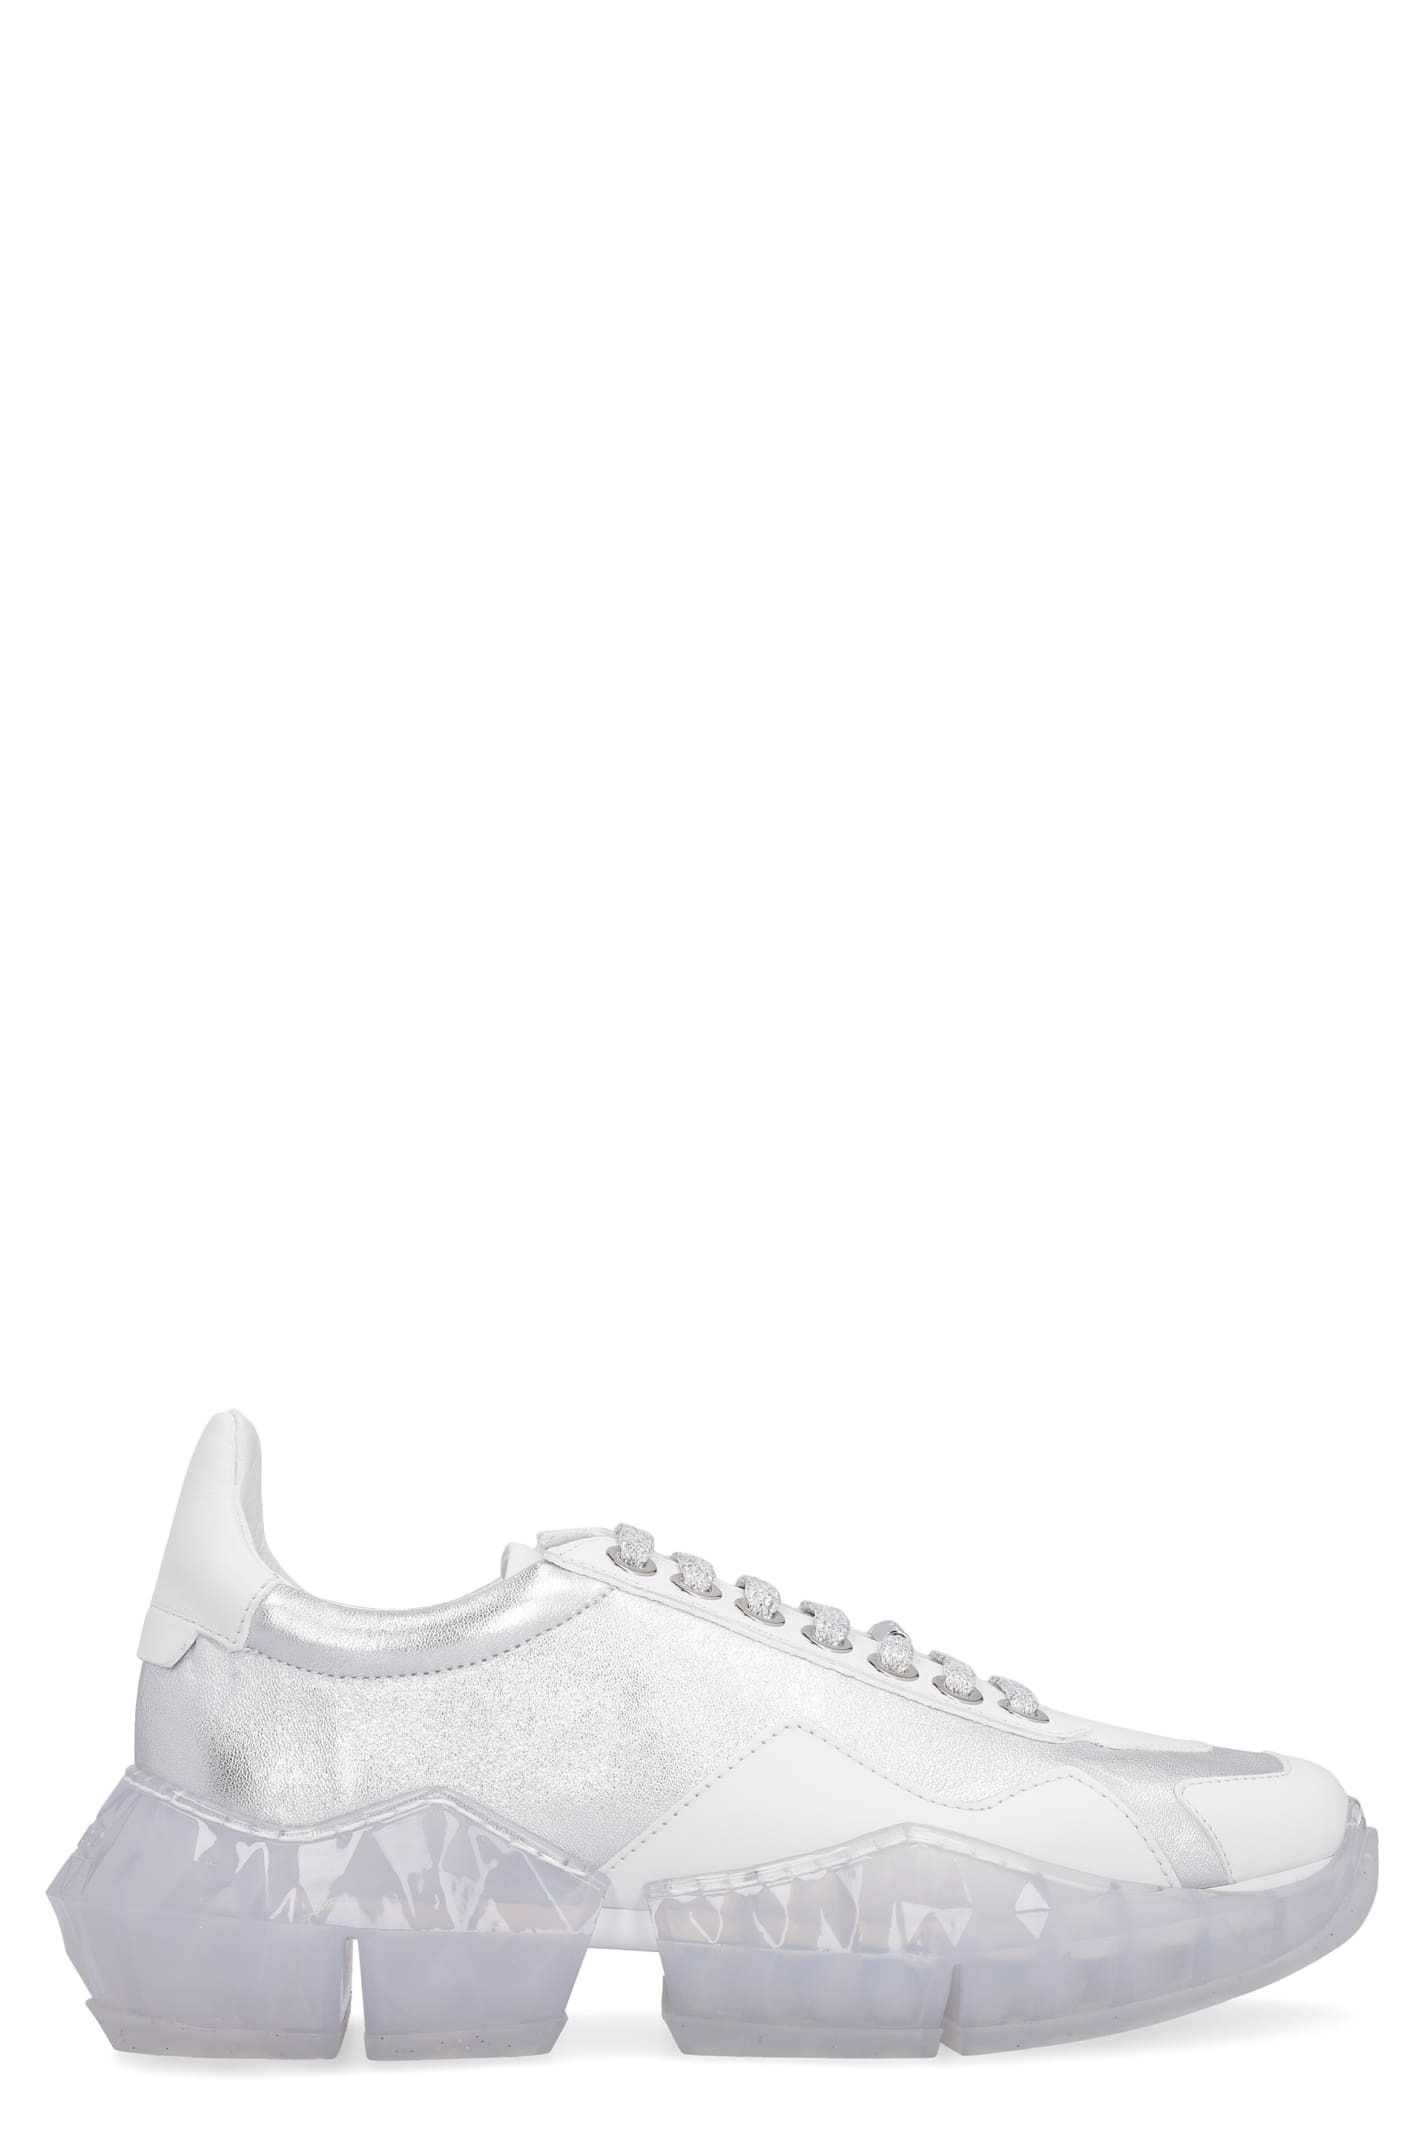 Jimmy Choo Diamond F Leather Low-top Sneakers